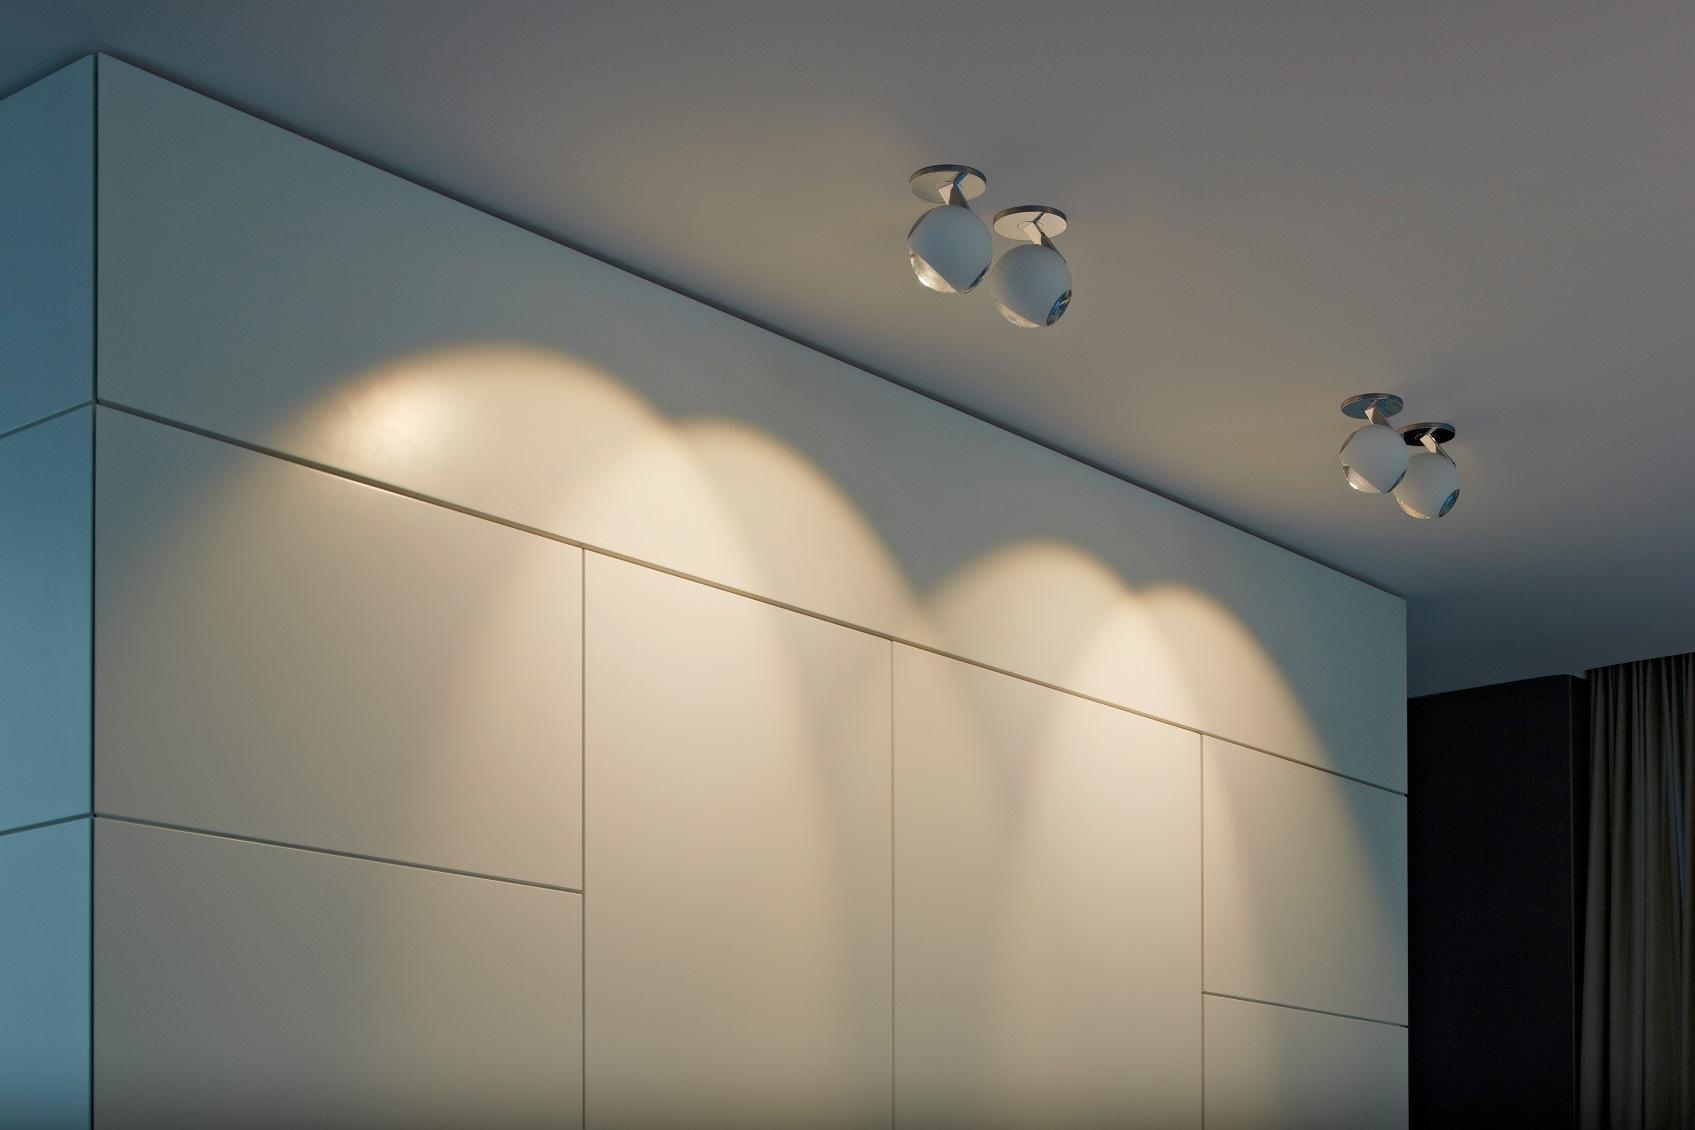 lichthuis geeft lichtadvies voor occhio io3d led opbouwspot